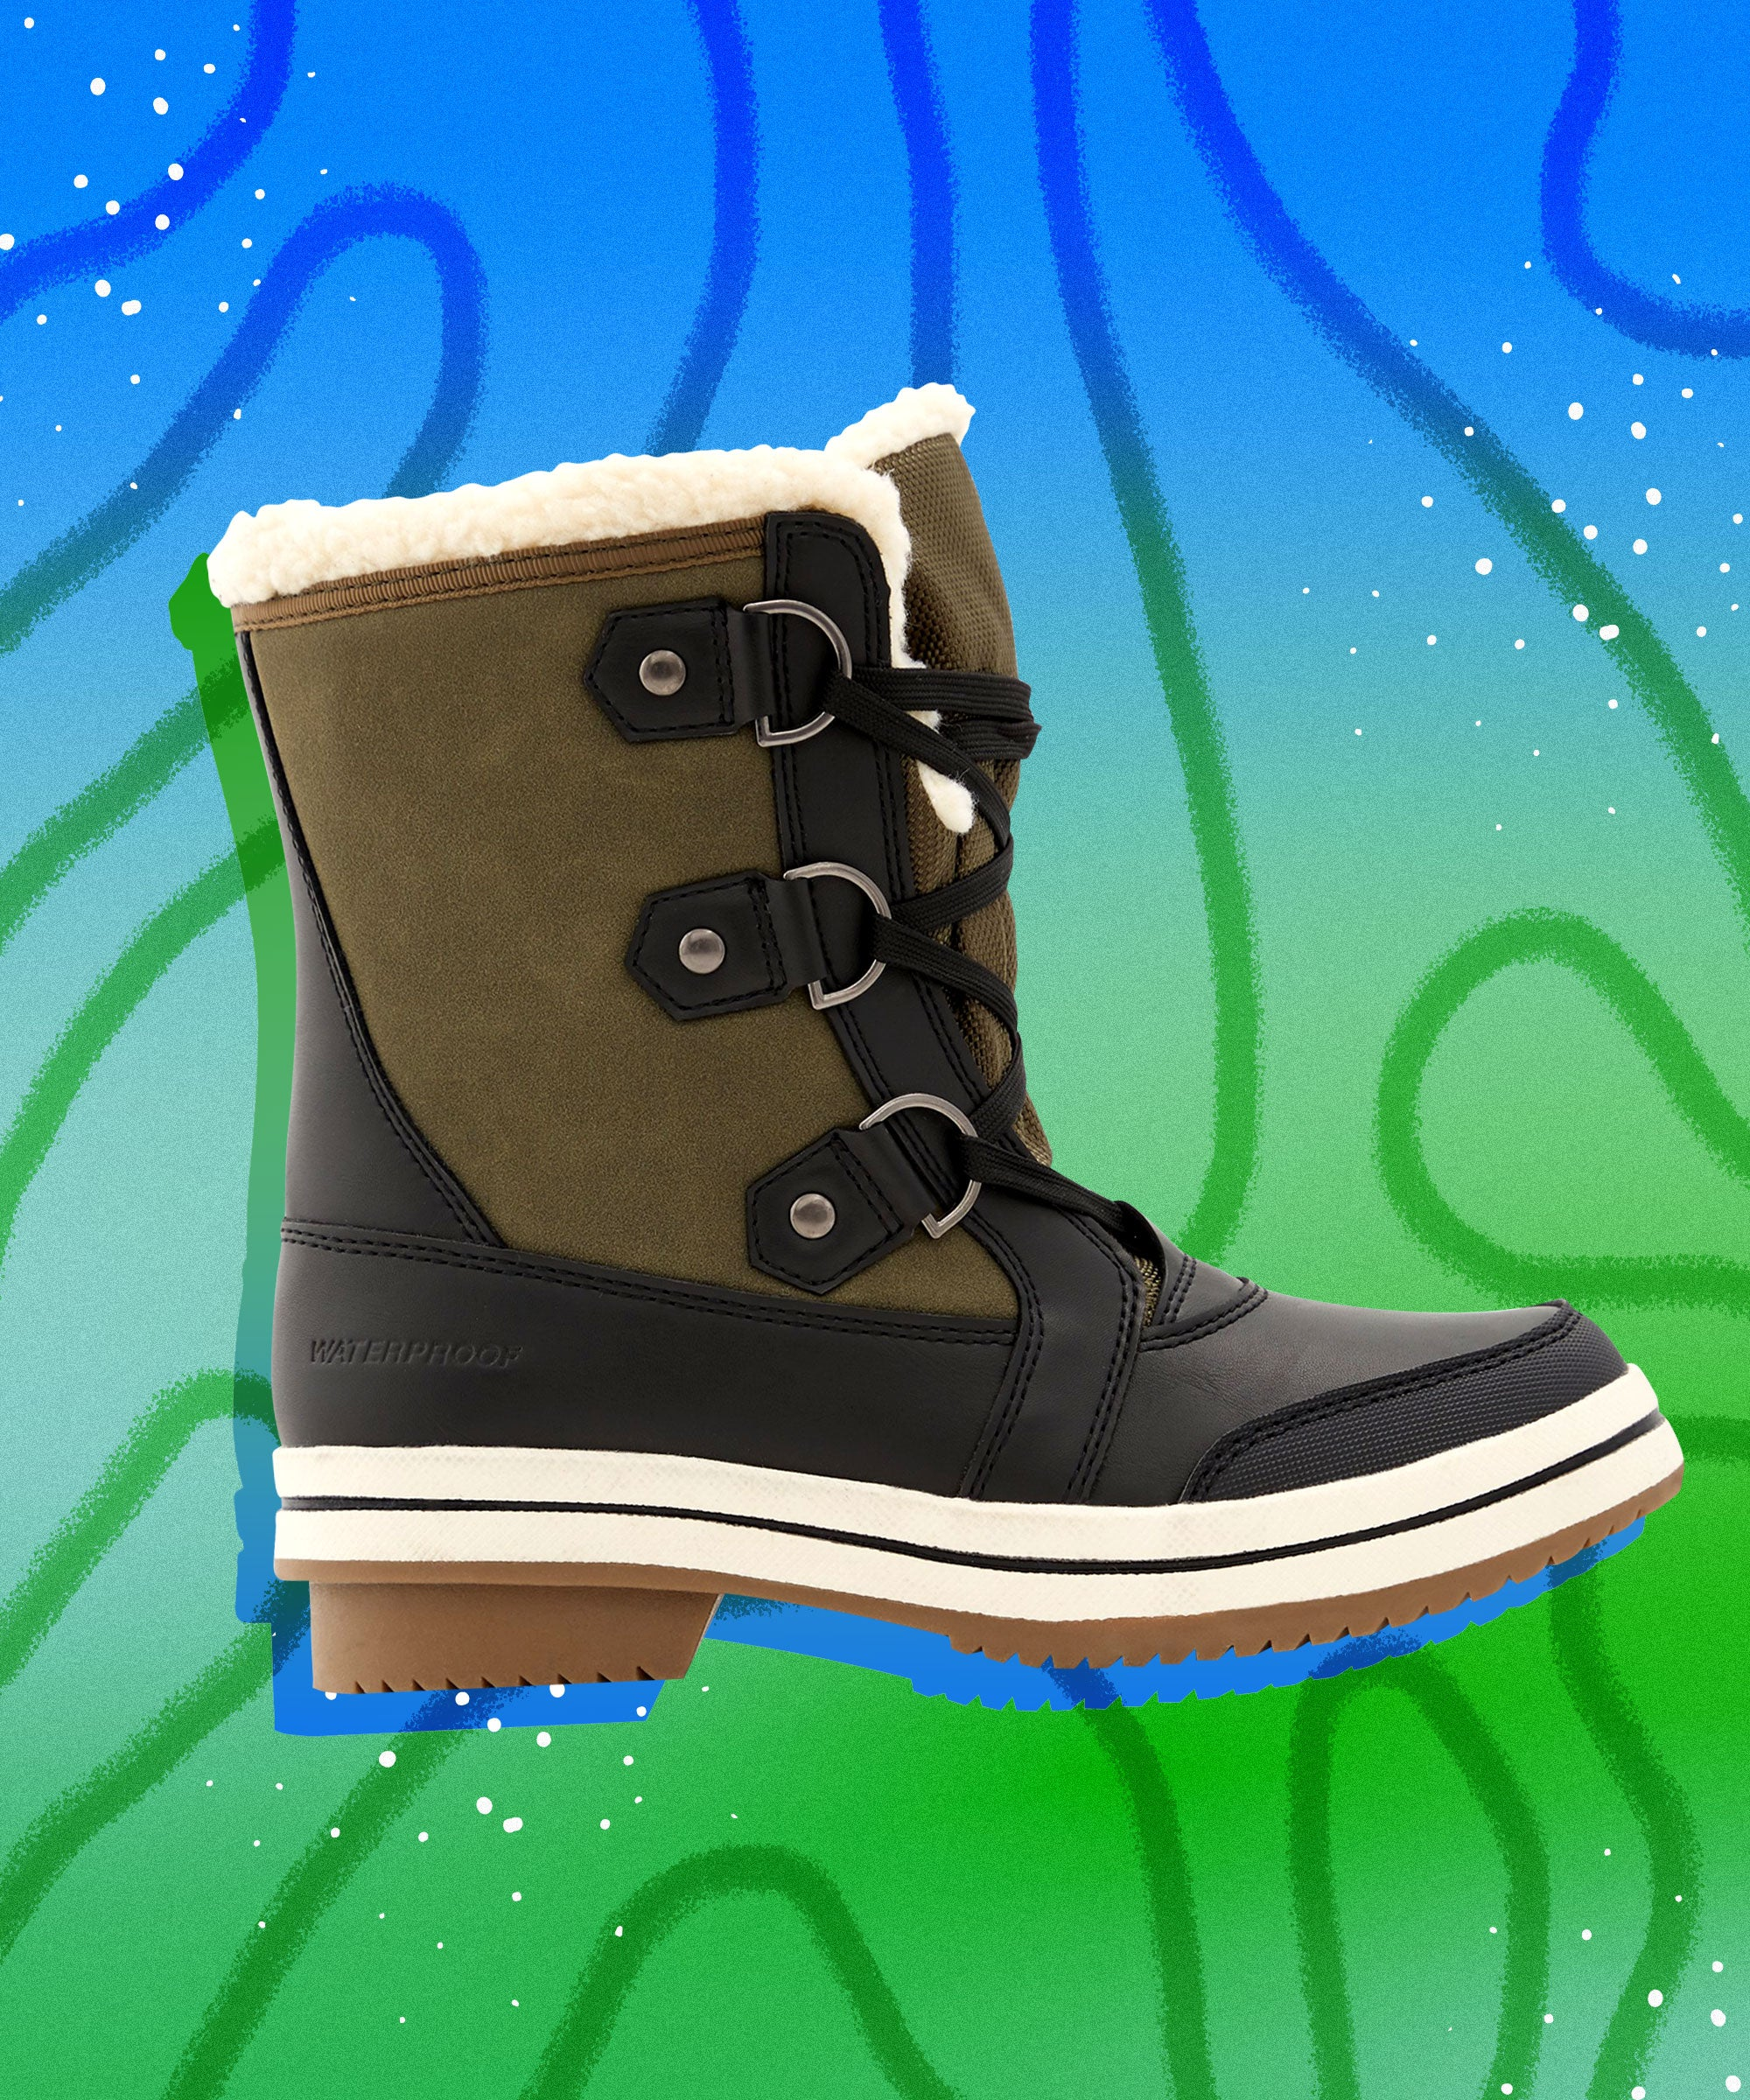 Best Women's Winter Boots Canada: Sorel